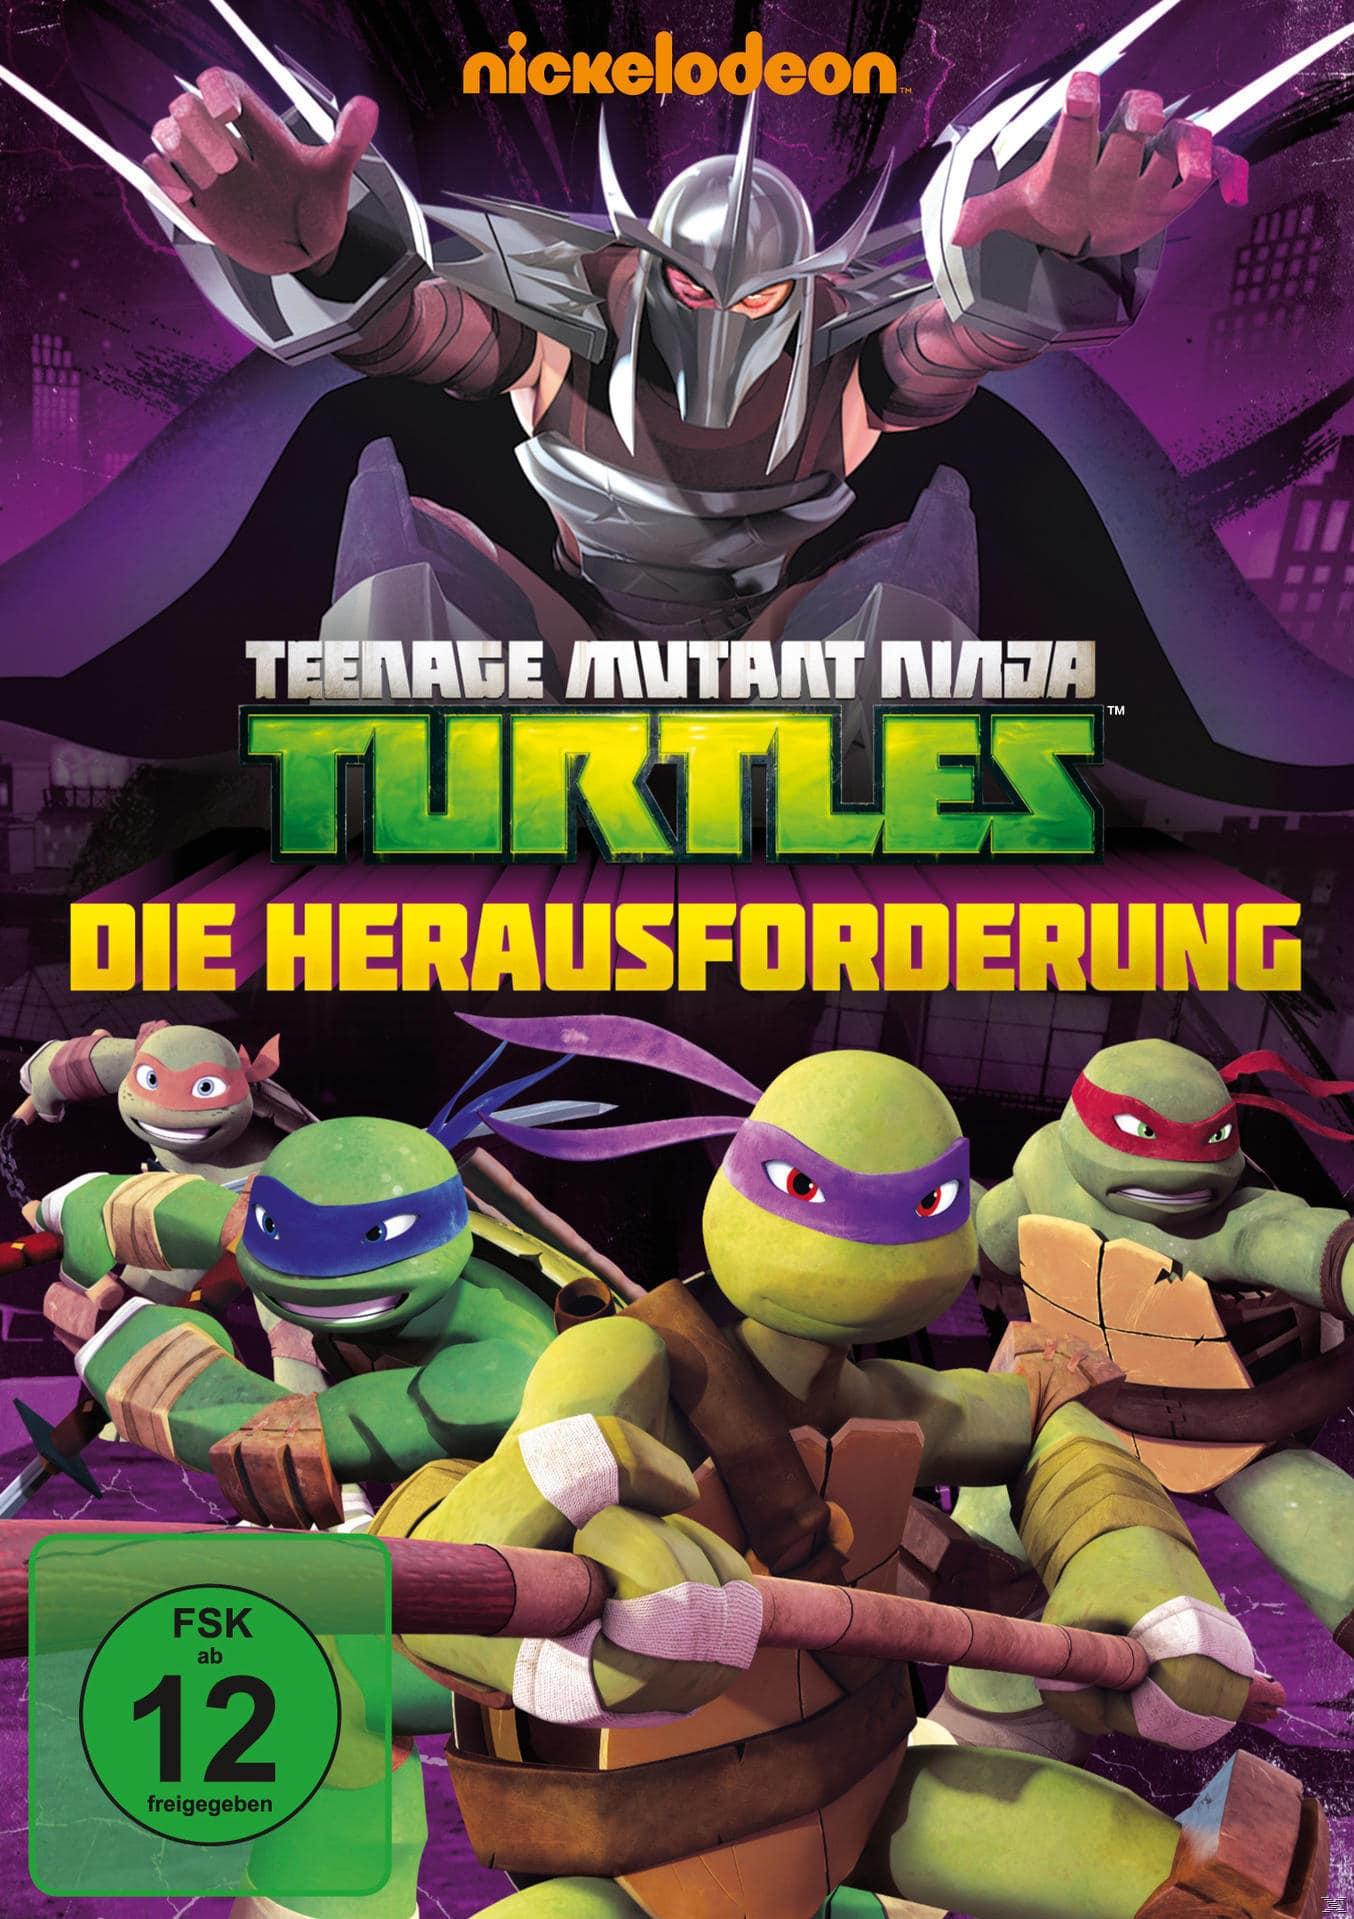 Teenage Mutant Ninja Turtles: Die Herausforderung (DVD) für 7,99 Euro